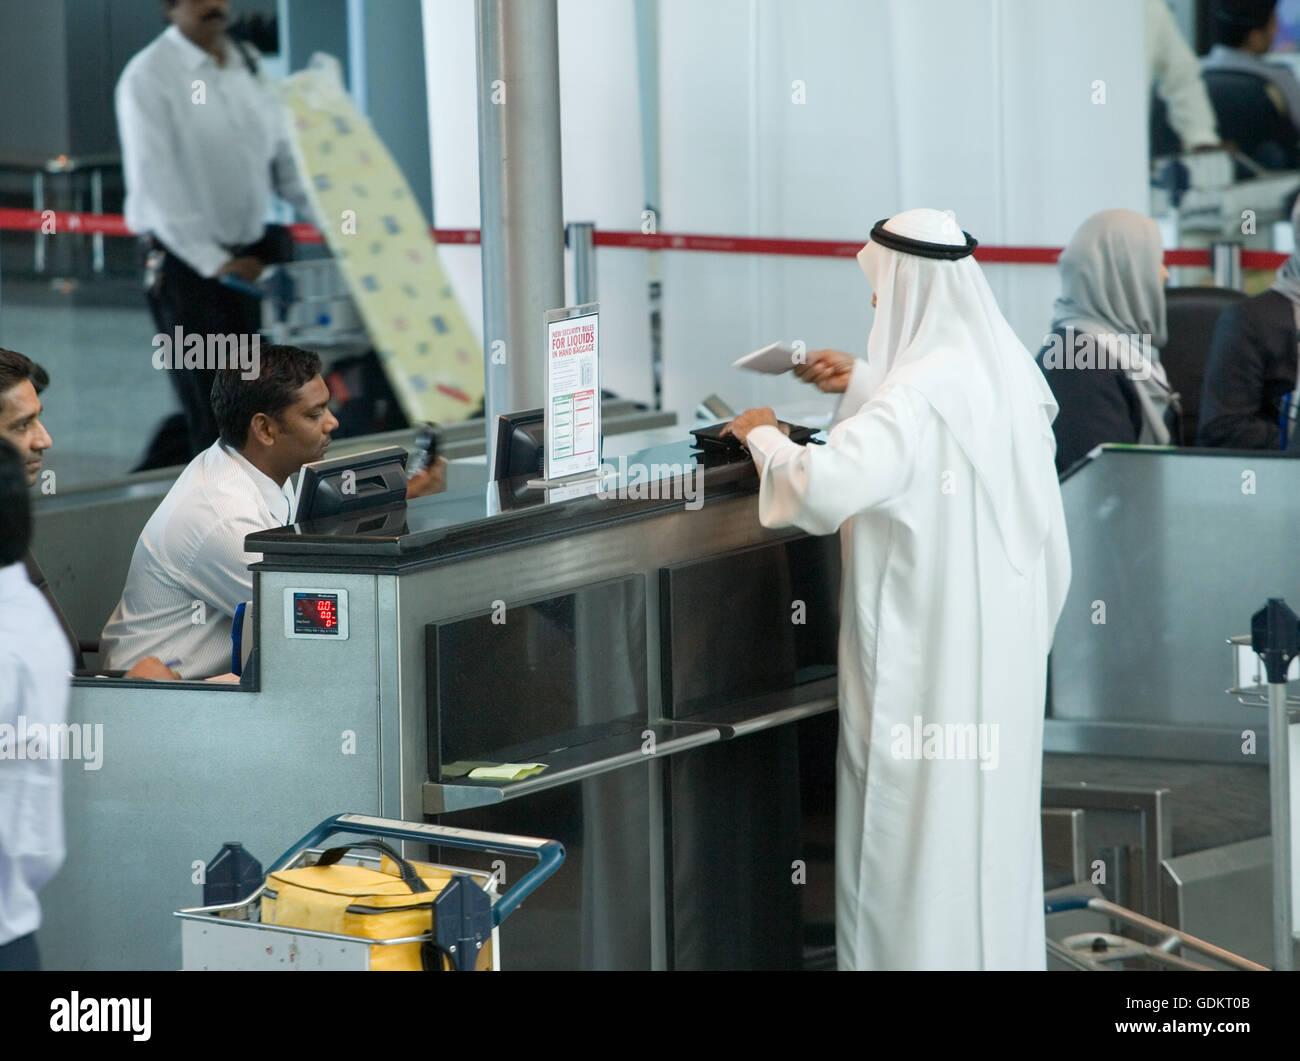 A man at a check-in counter, Sharjah International Airport